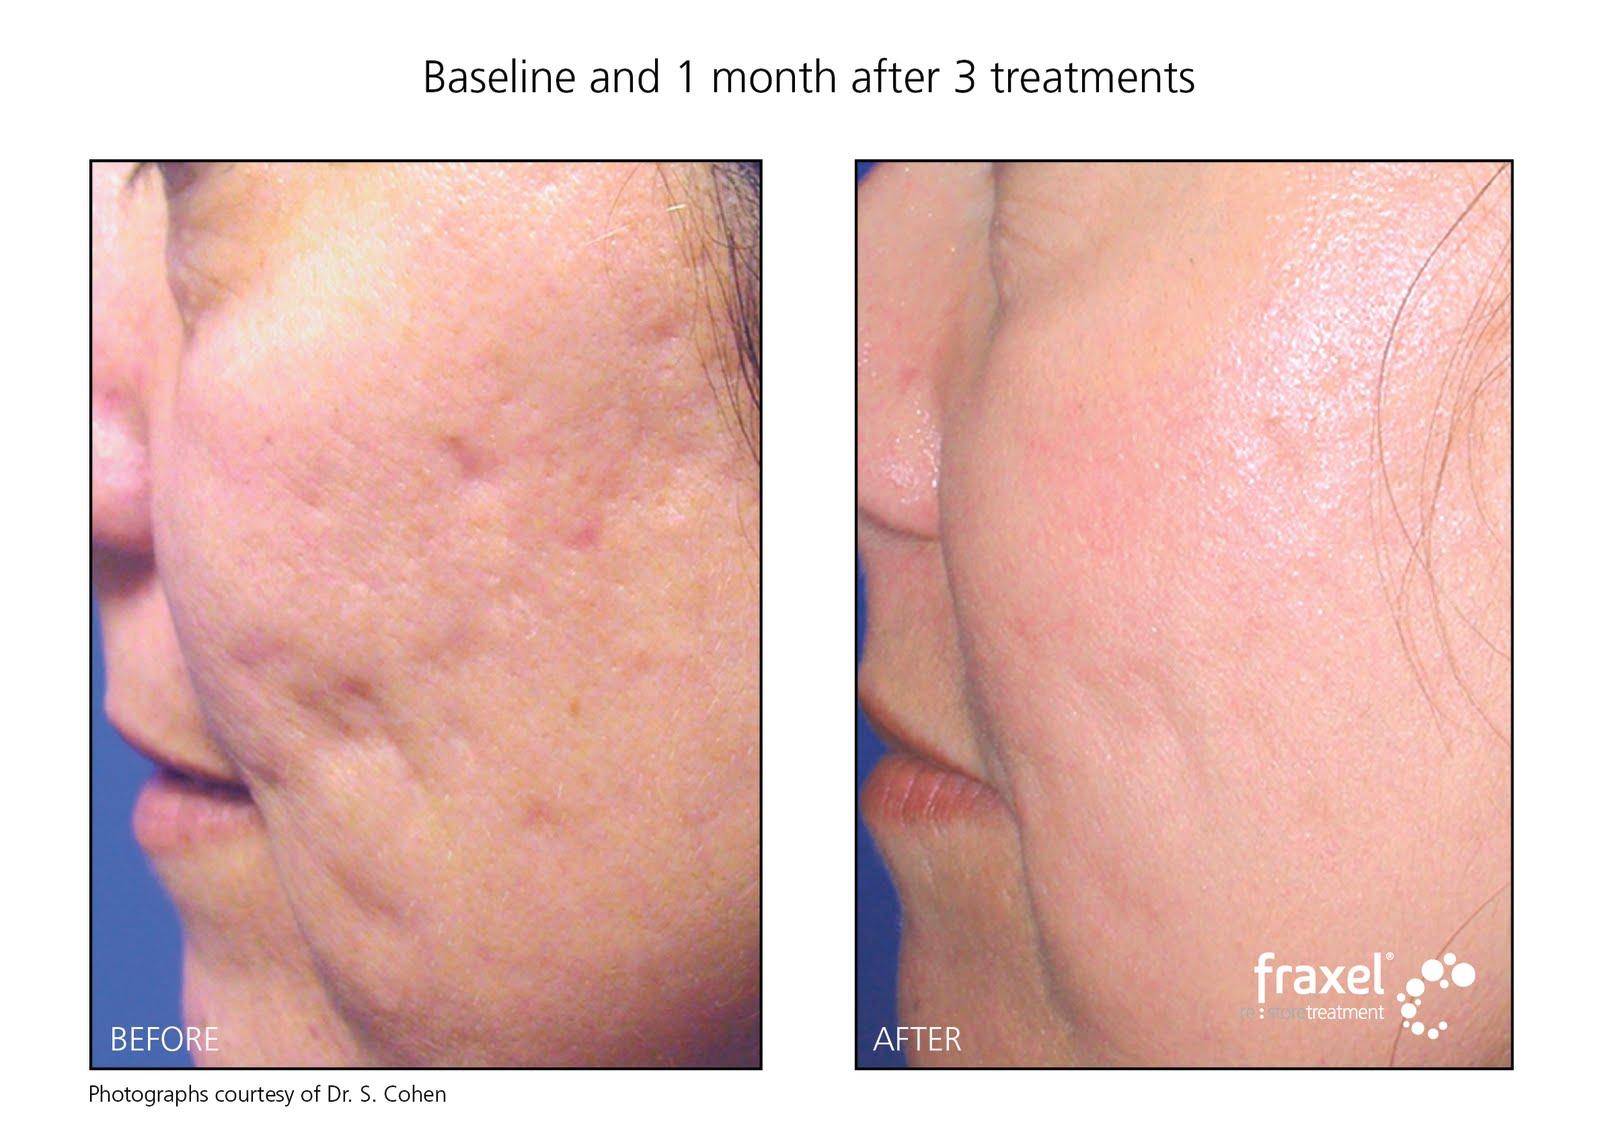 Acne Treatment Sydney Acne Scar Treatment With Fraxel